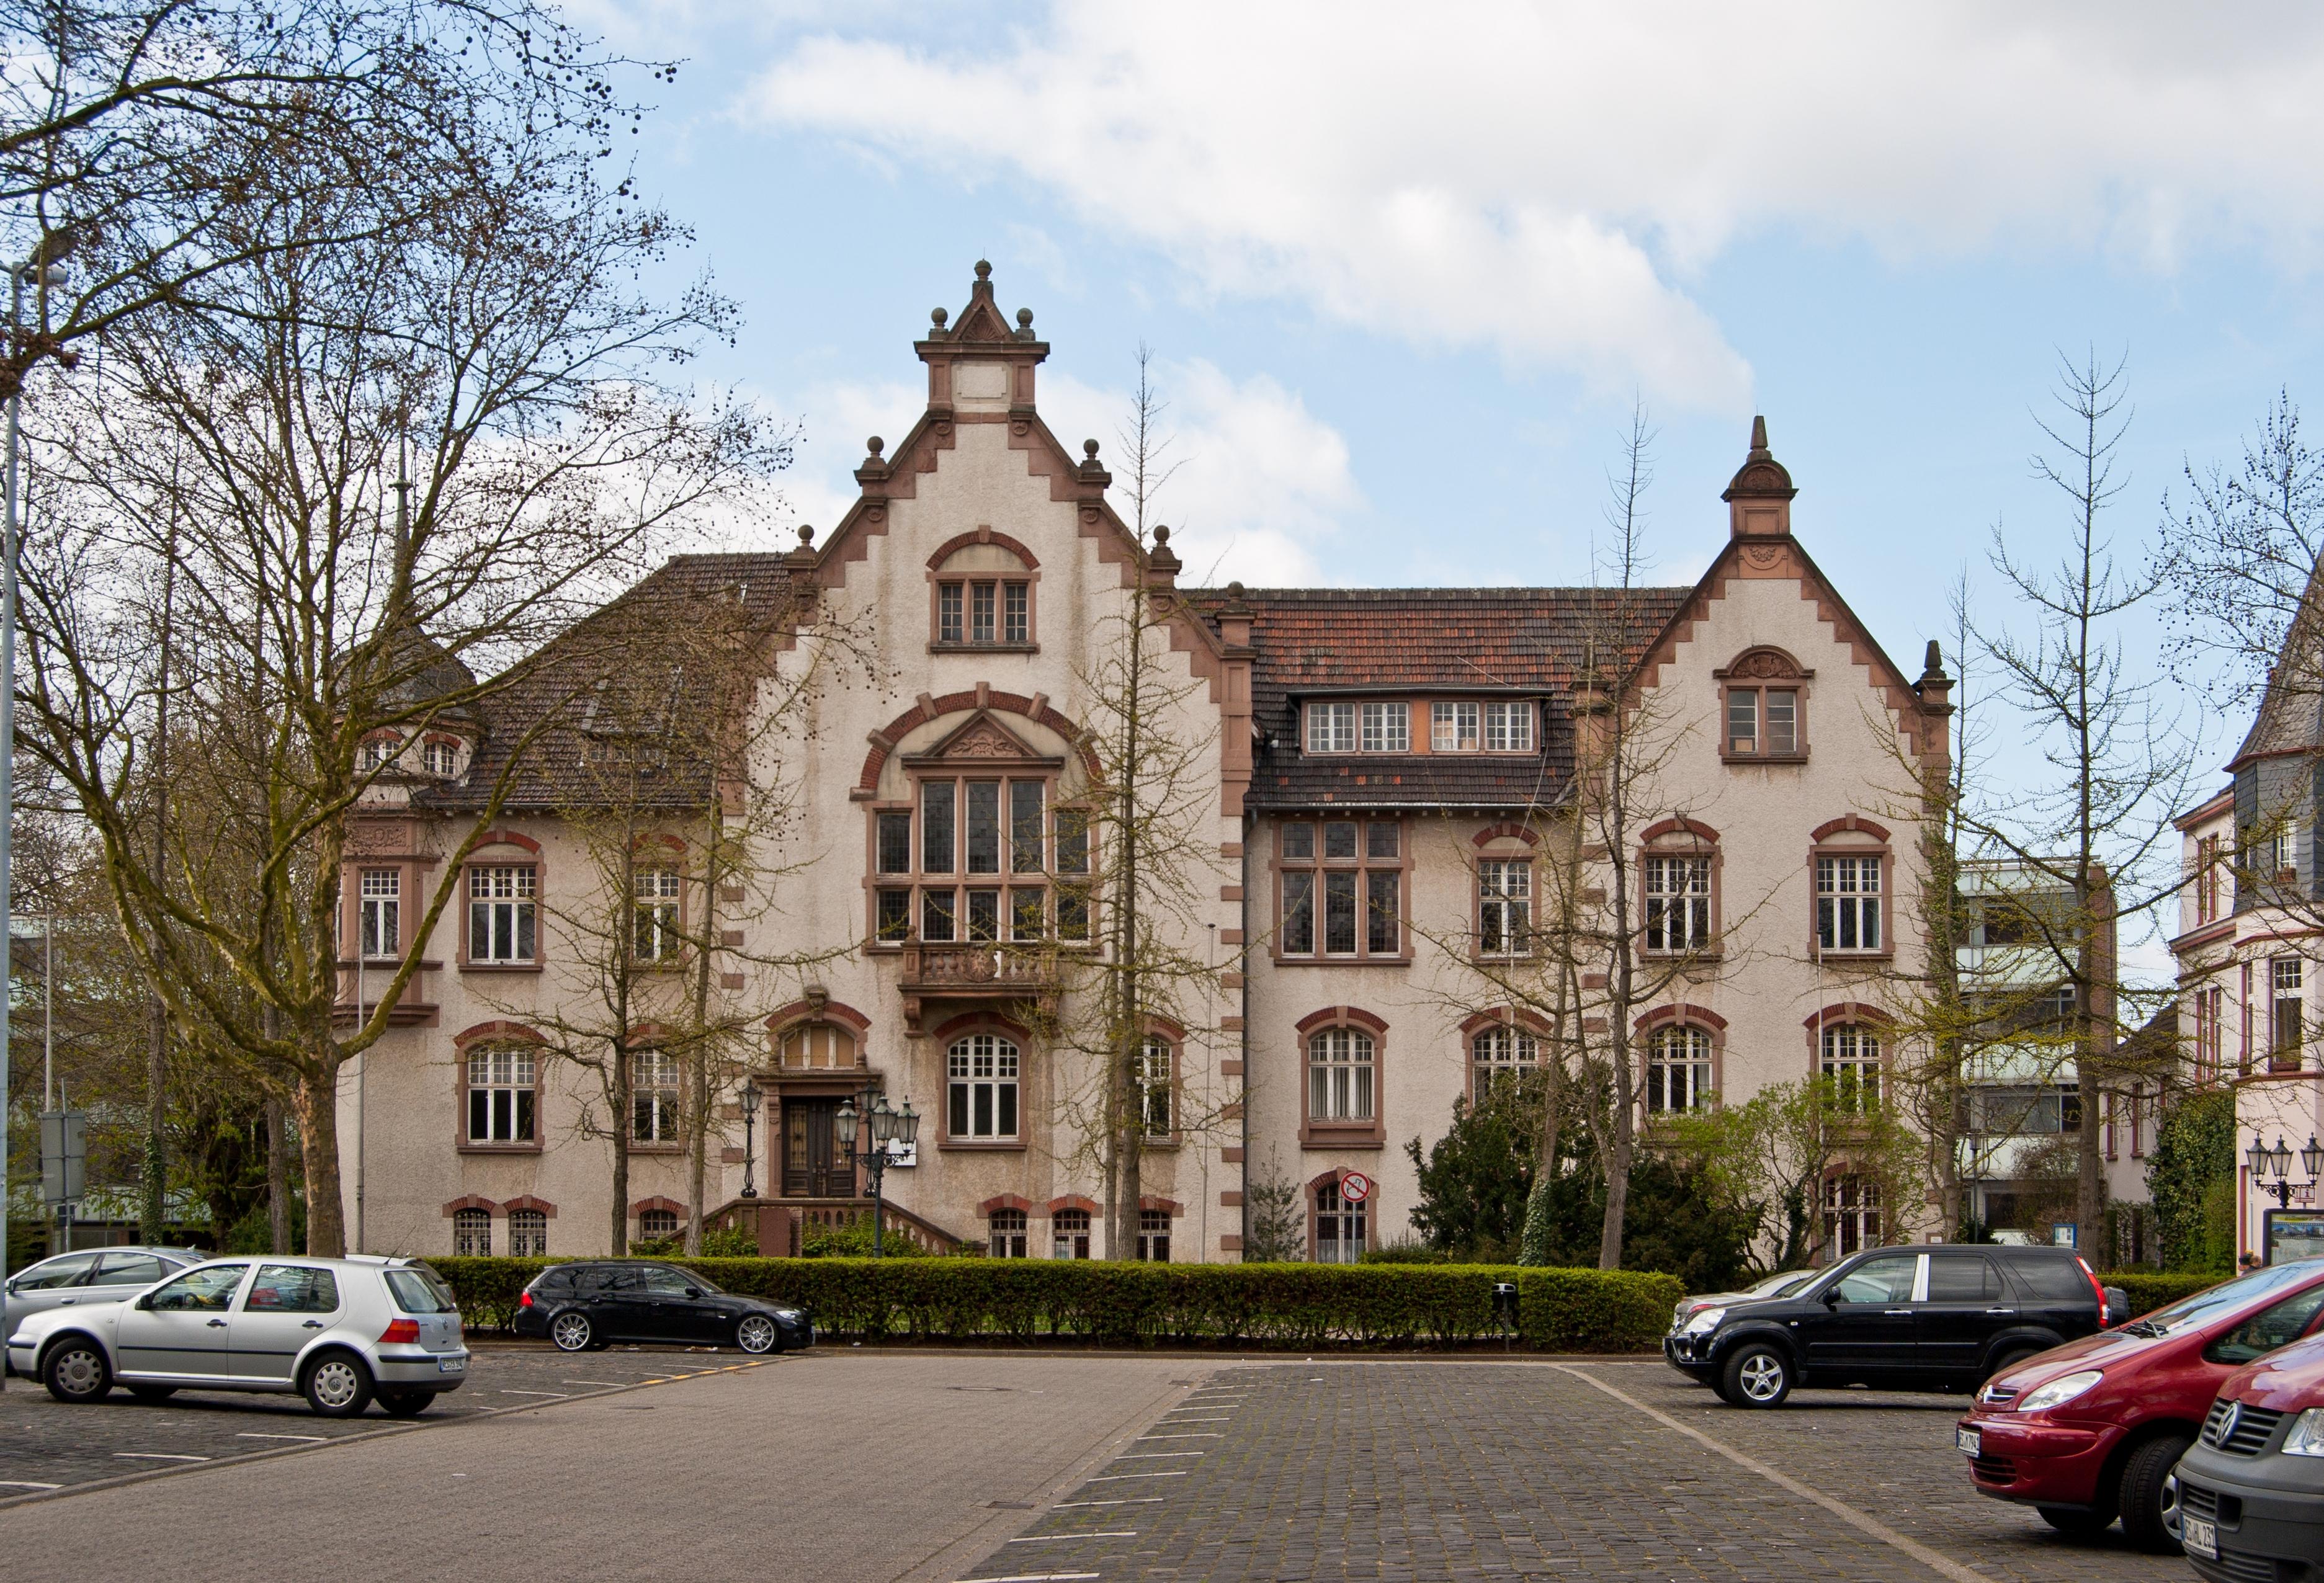 Www Nrz De Duesseldorf Kleinstes Hotel Id  Htm